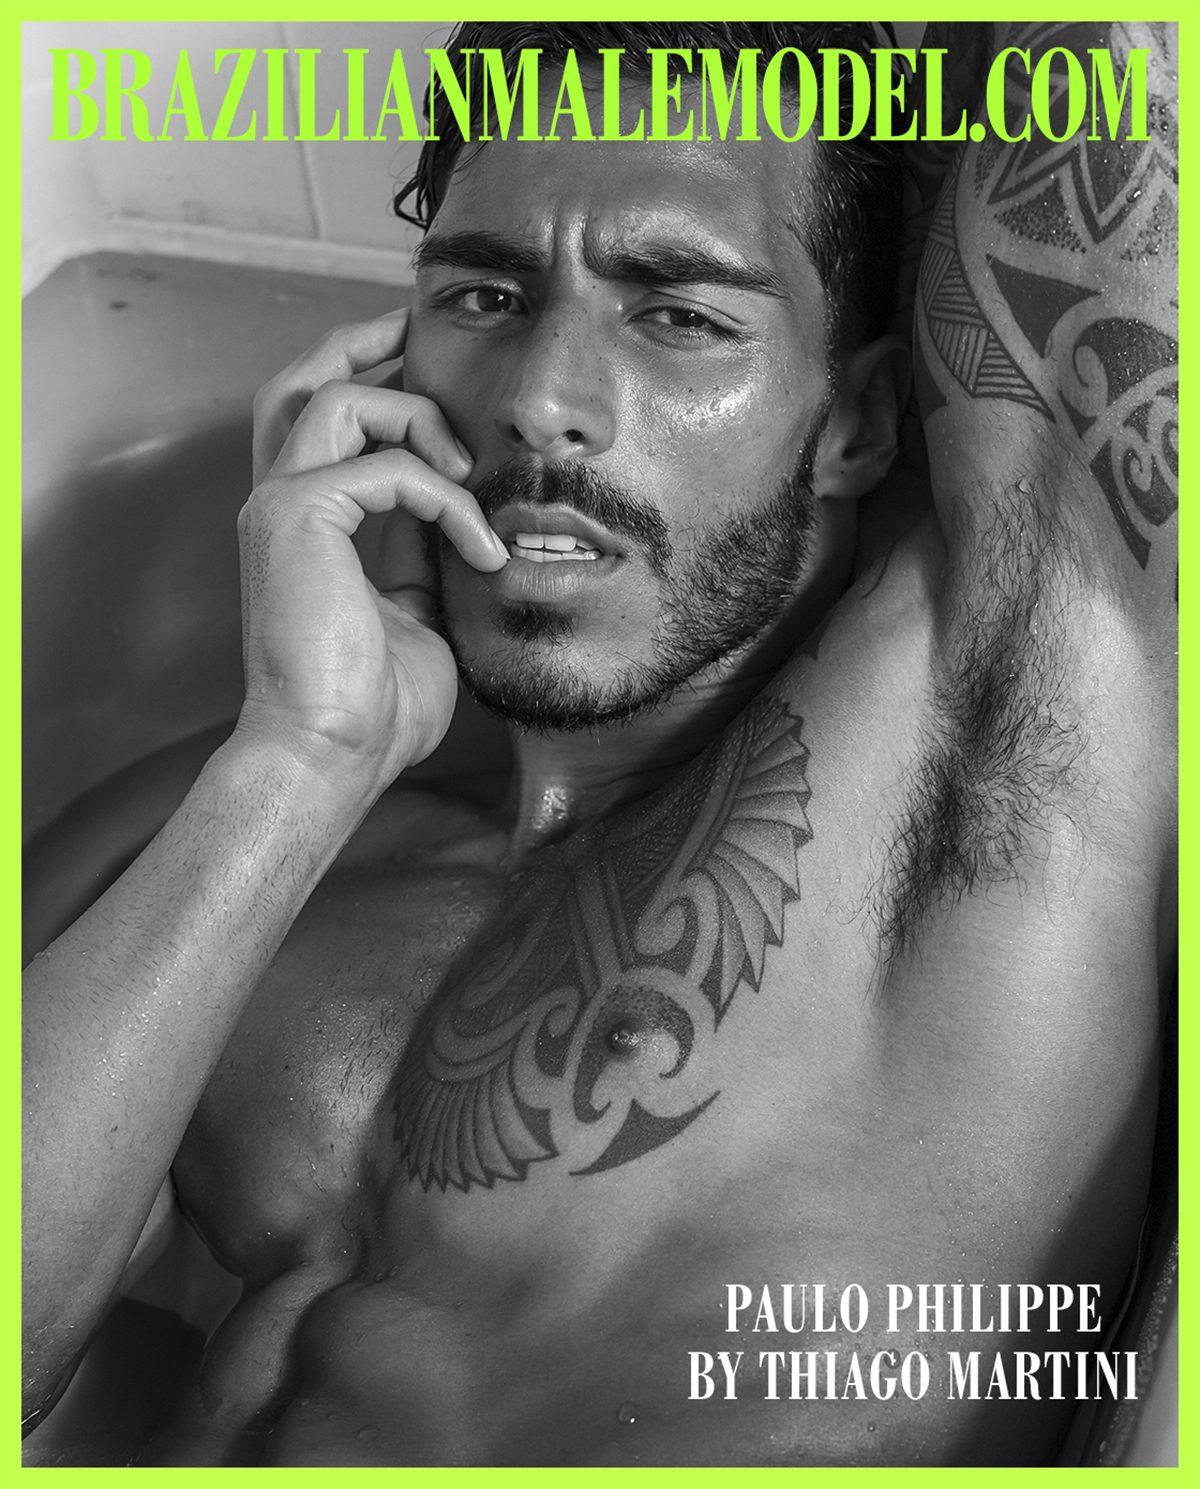 Paulo Philippe by Thiago Martini